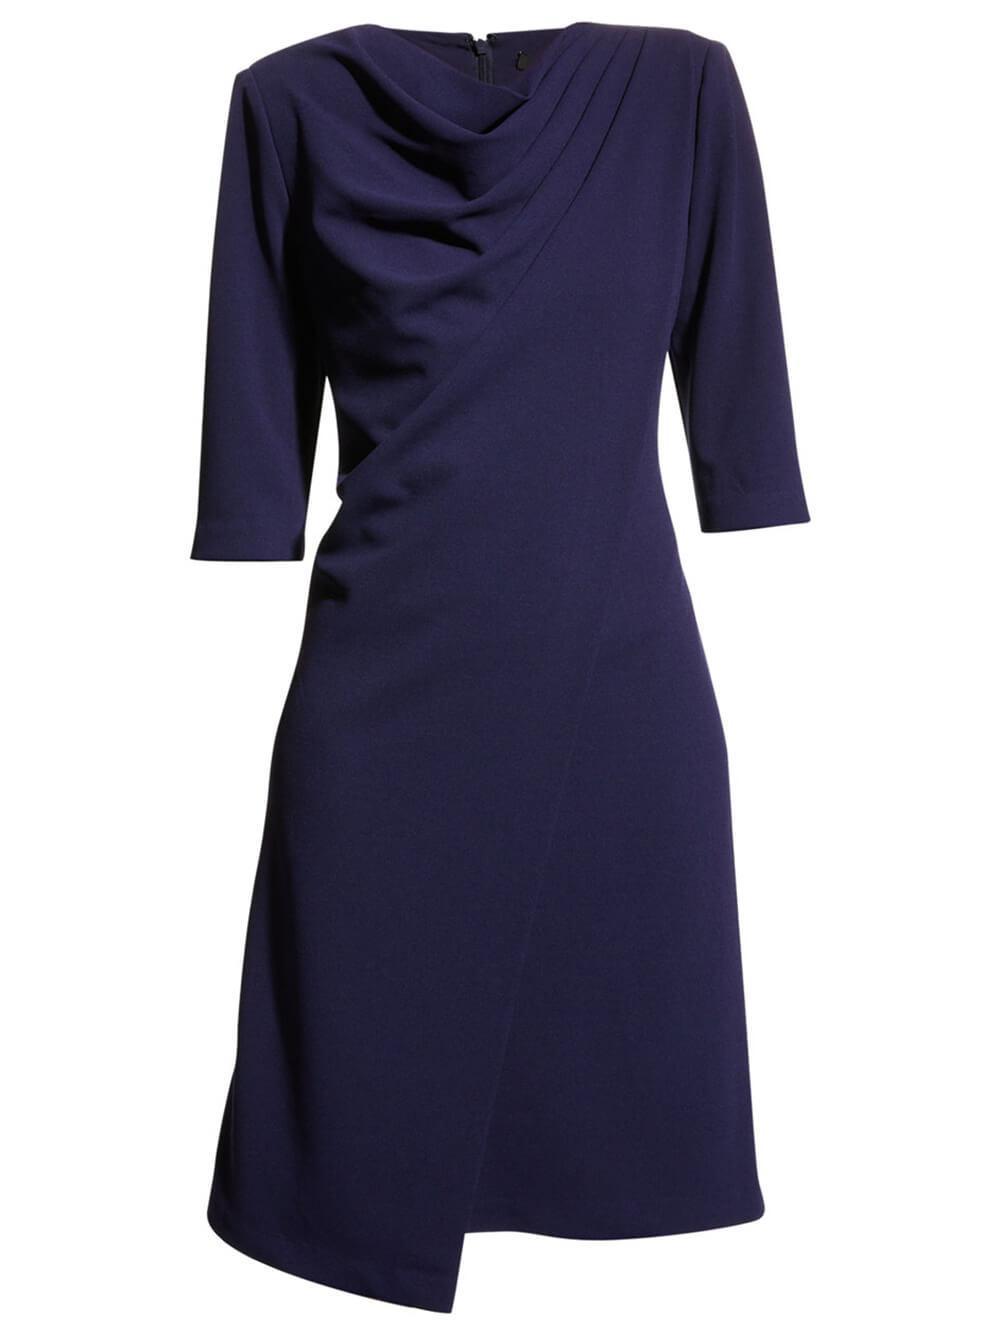 Draped High Neck Dress Item # BSD4560